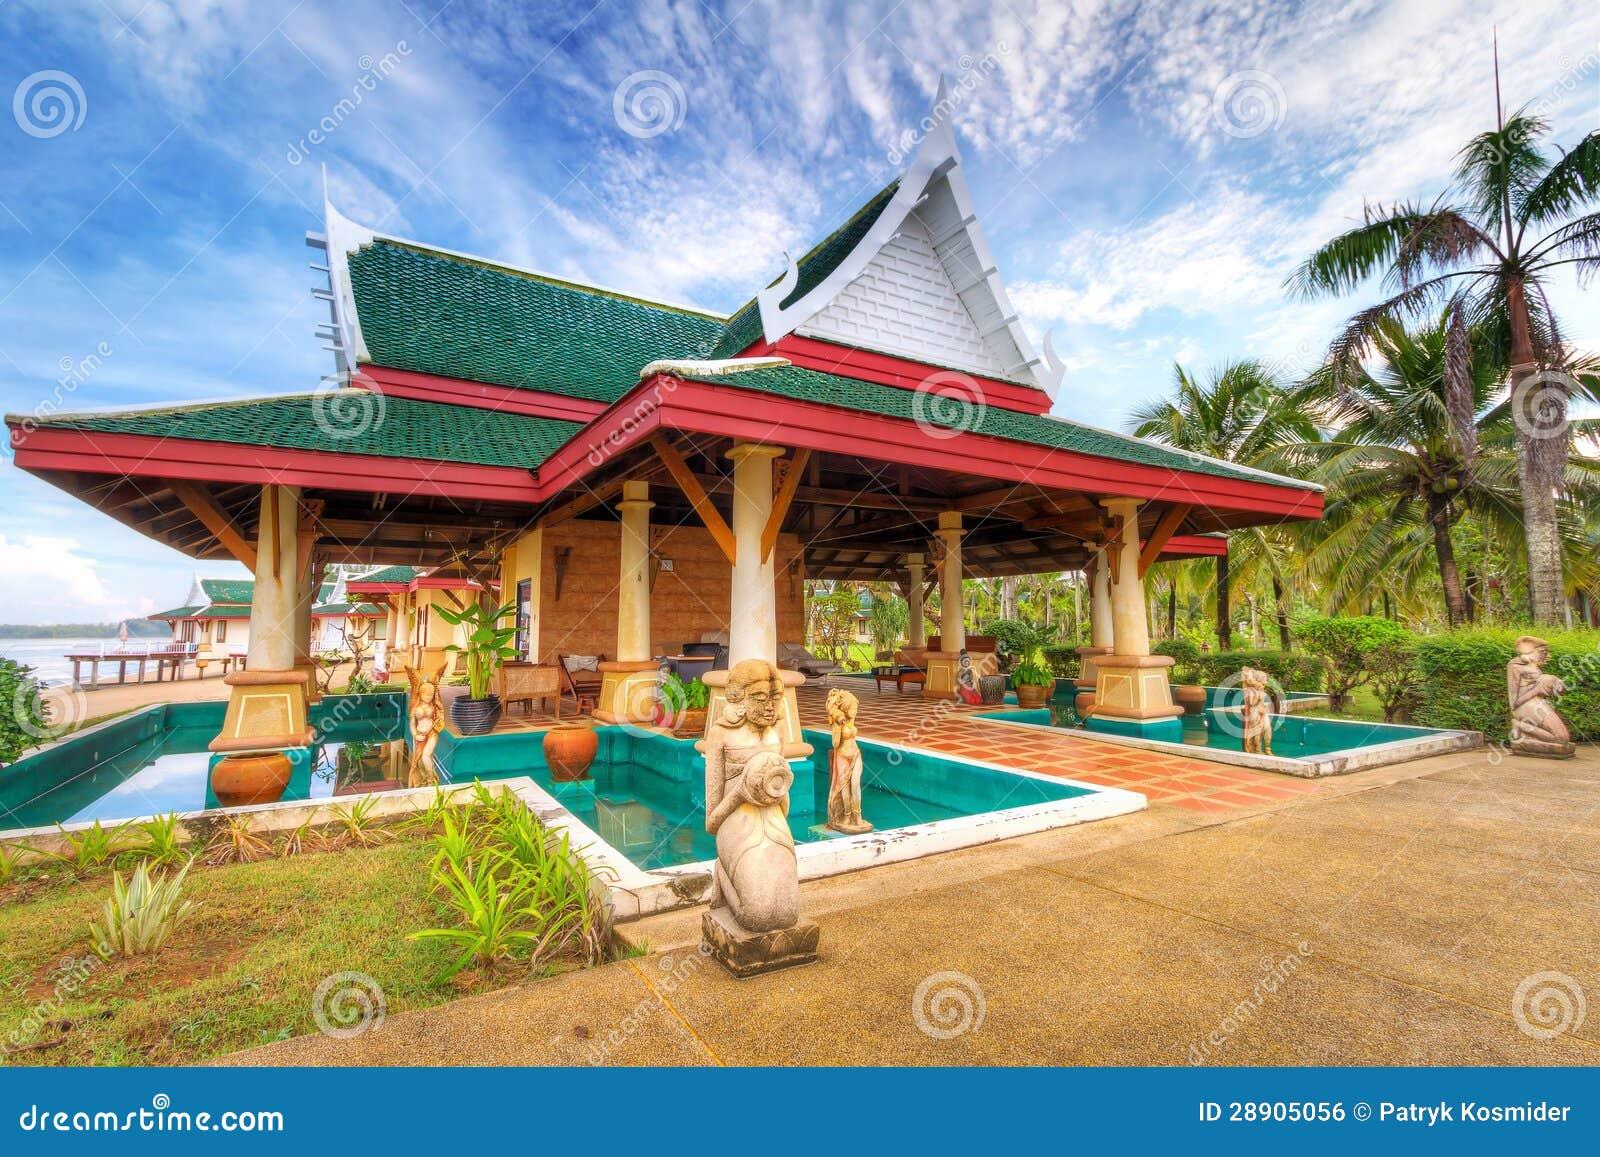 Oriental architecture spa building stock photo image for Architecture orientale